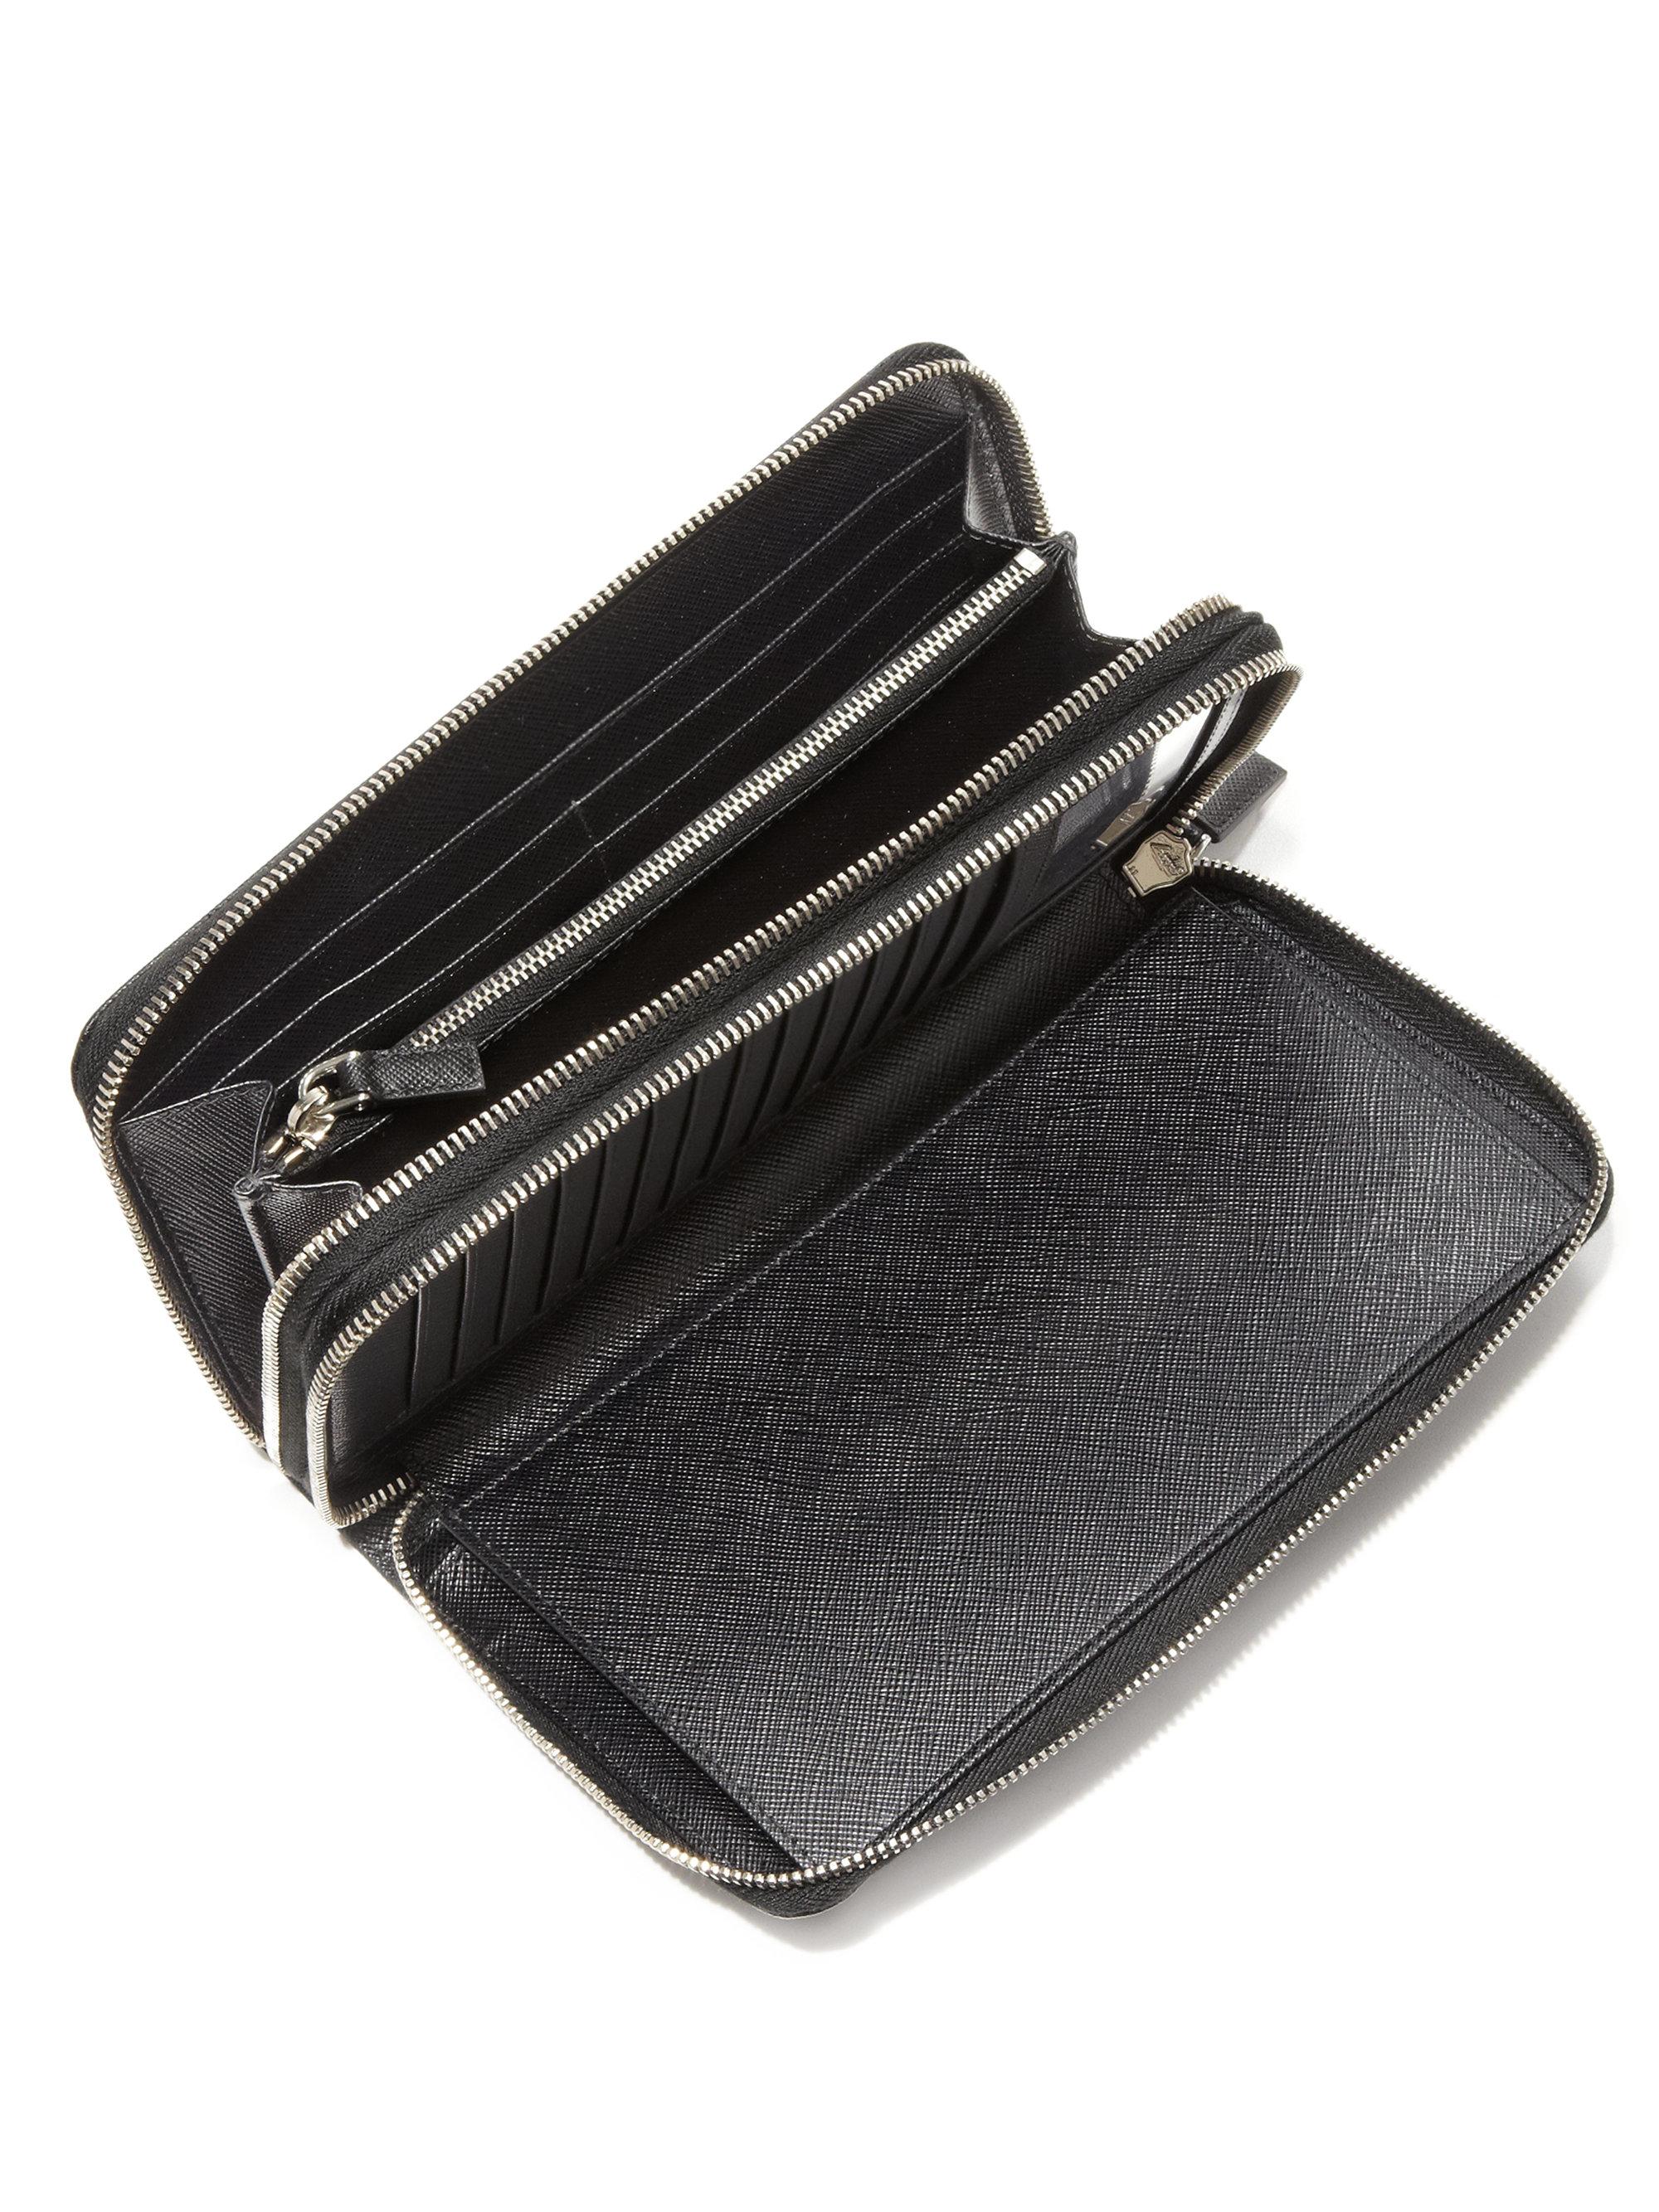 ... wholesale lyst prada portafoglio lampo wallet in black for men 07b15  20c2d 8bb105a93d596